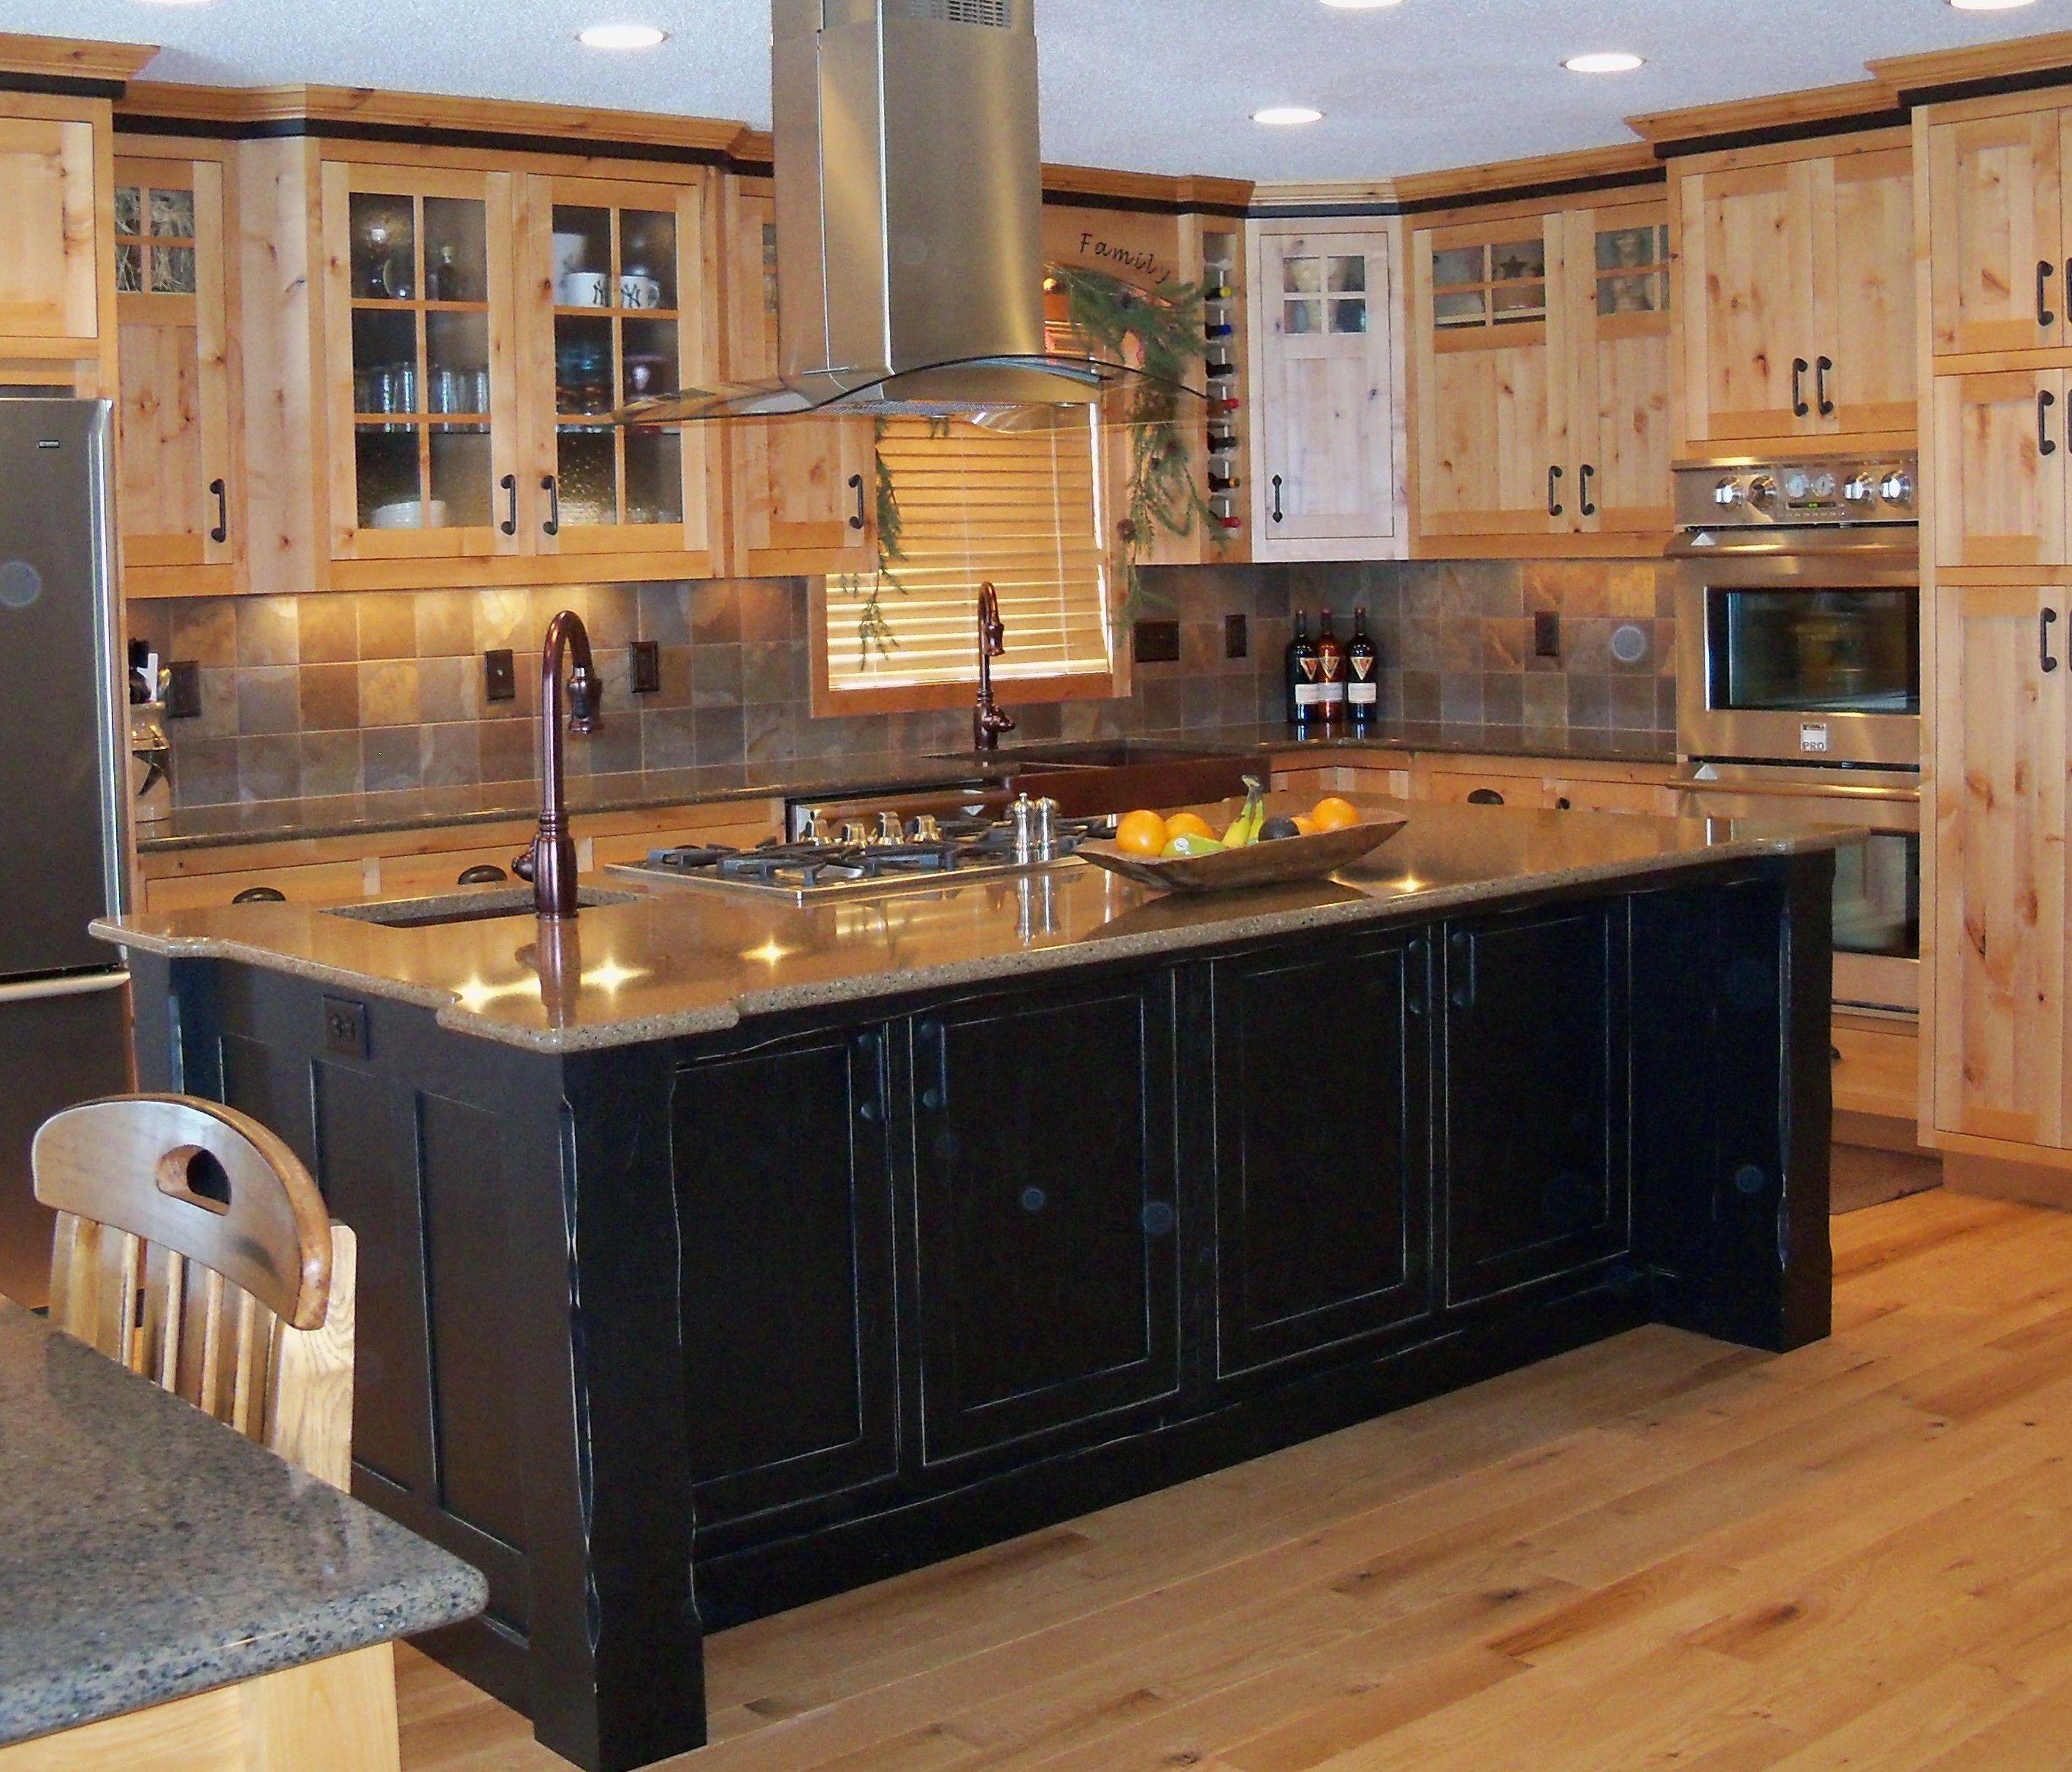 Stunning Kitchen Island Cabinets Hickory Kitchen Cabinets Distressed Kitchen Cabinets Black Kitchen Island